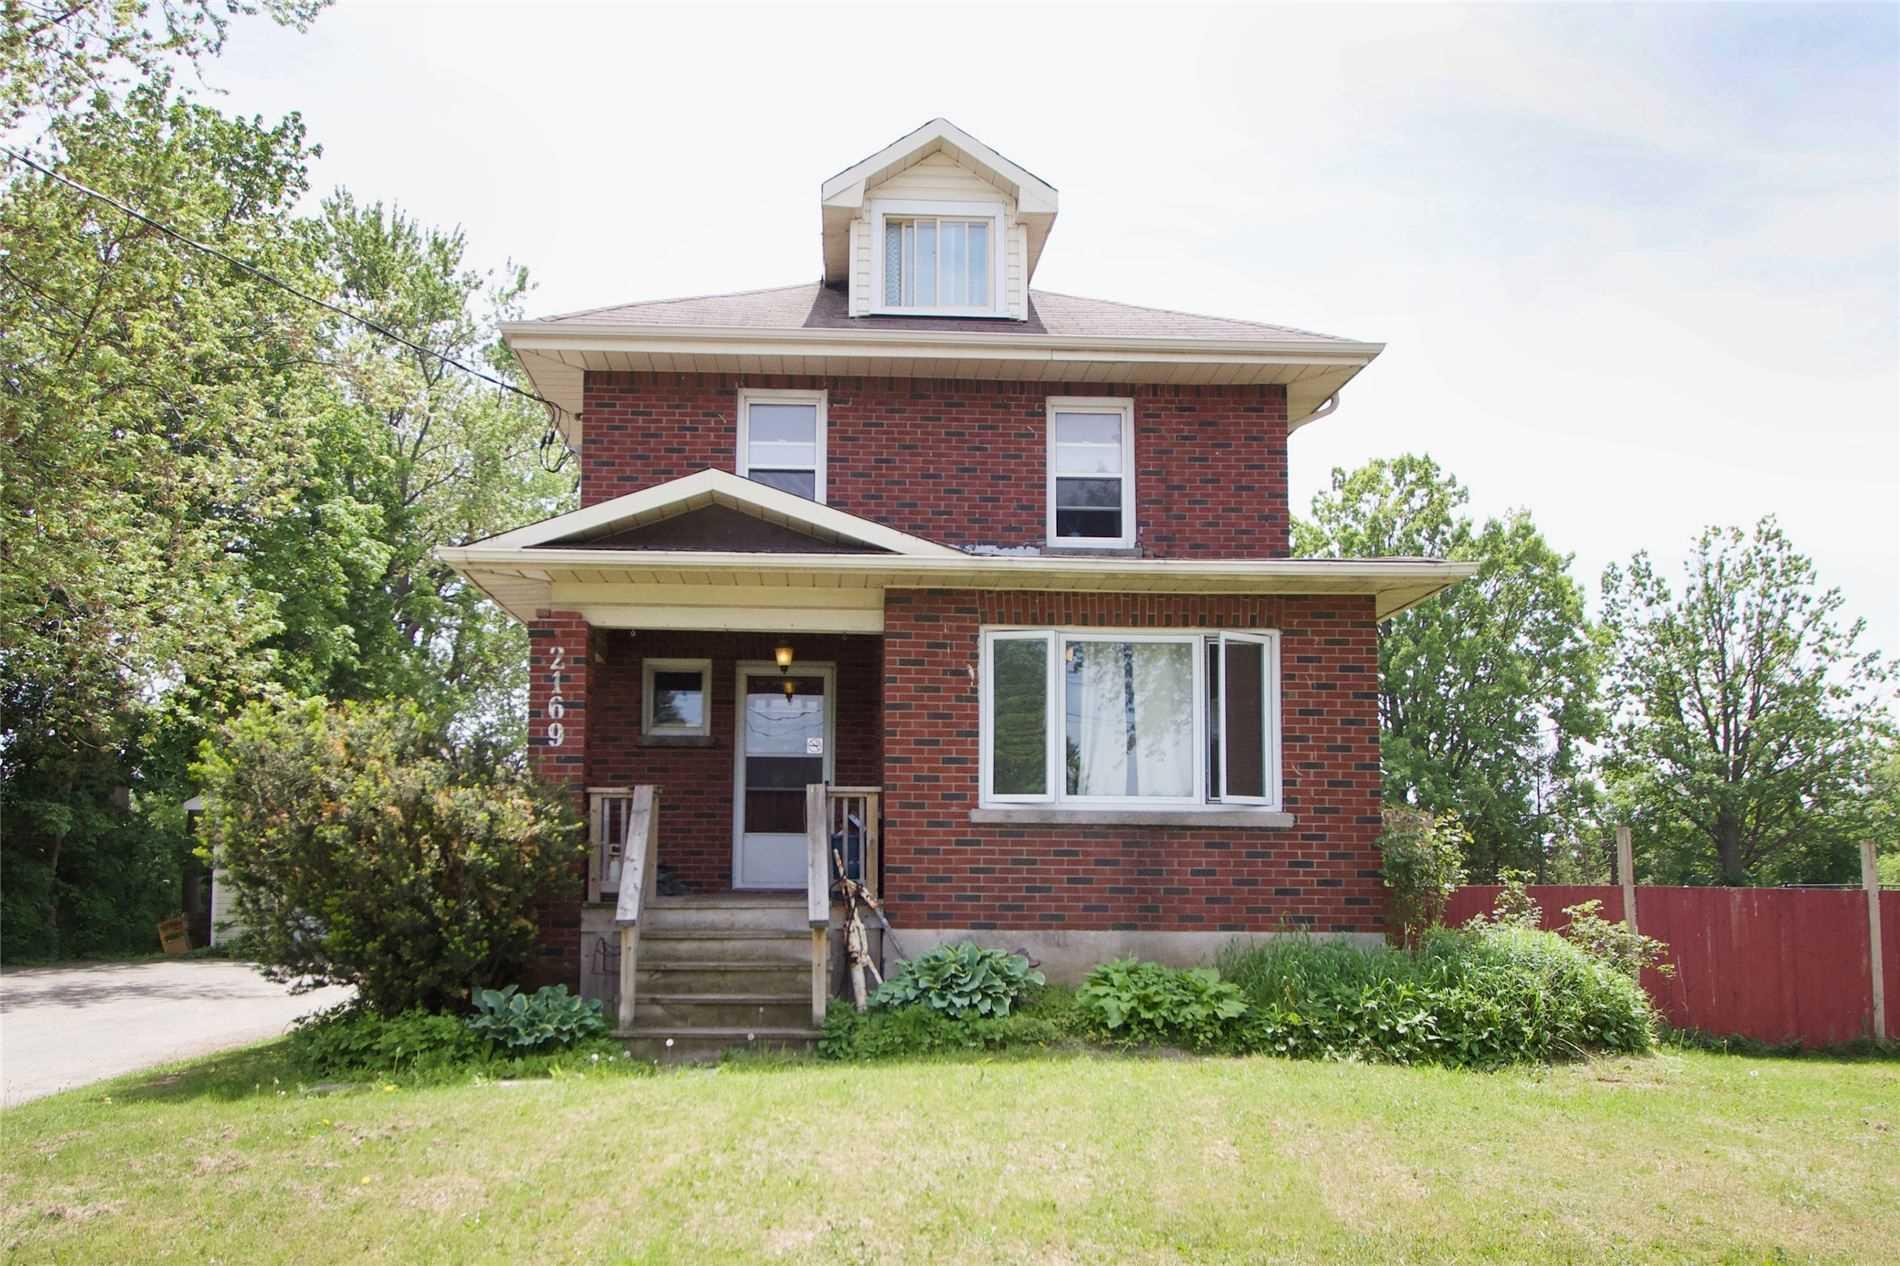 2169 Highway 2, Clarington, Ontario L1C 3K7, 3 Bedrooms Bedrooms, ,2 BathroomsBathrooms,Detached,For Sale,Highway 2,E5272672